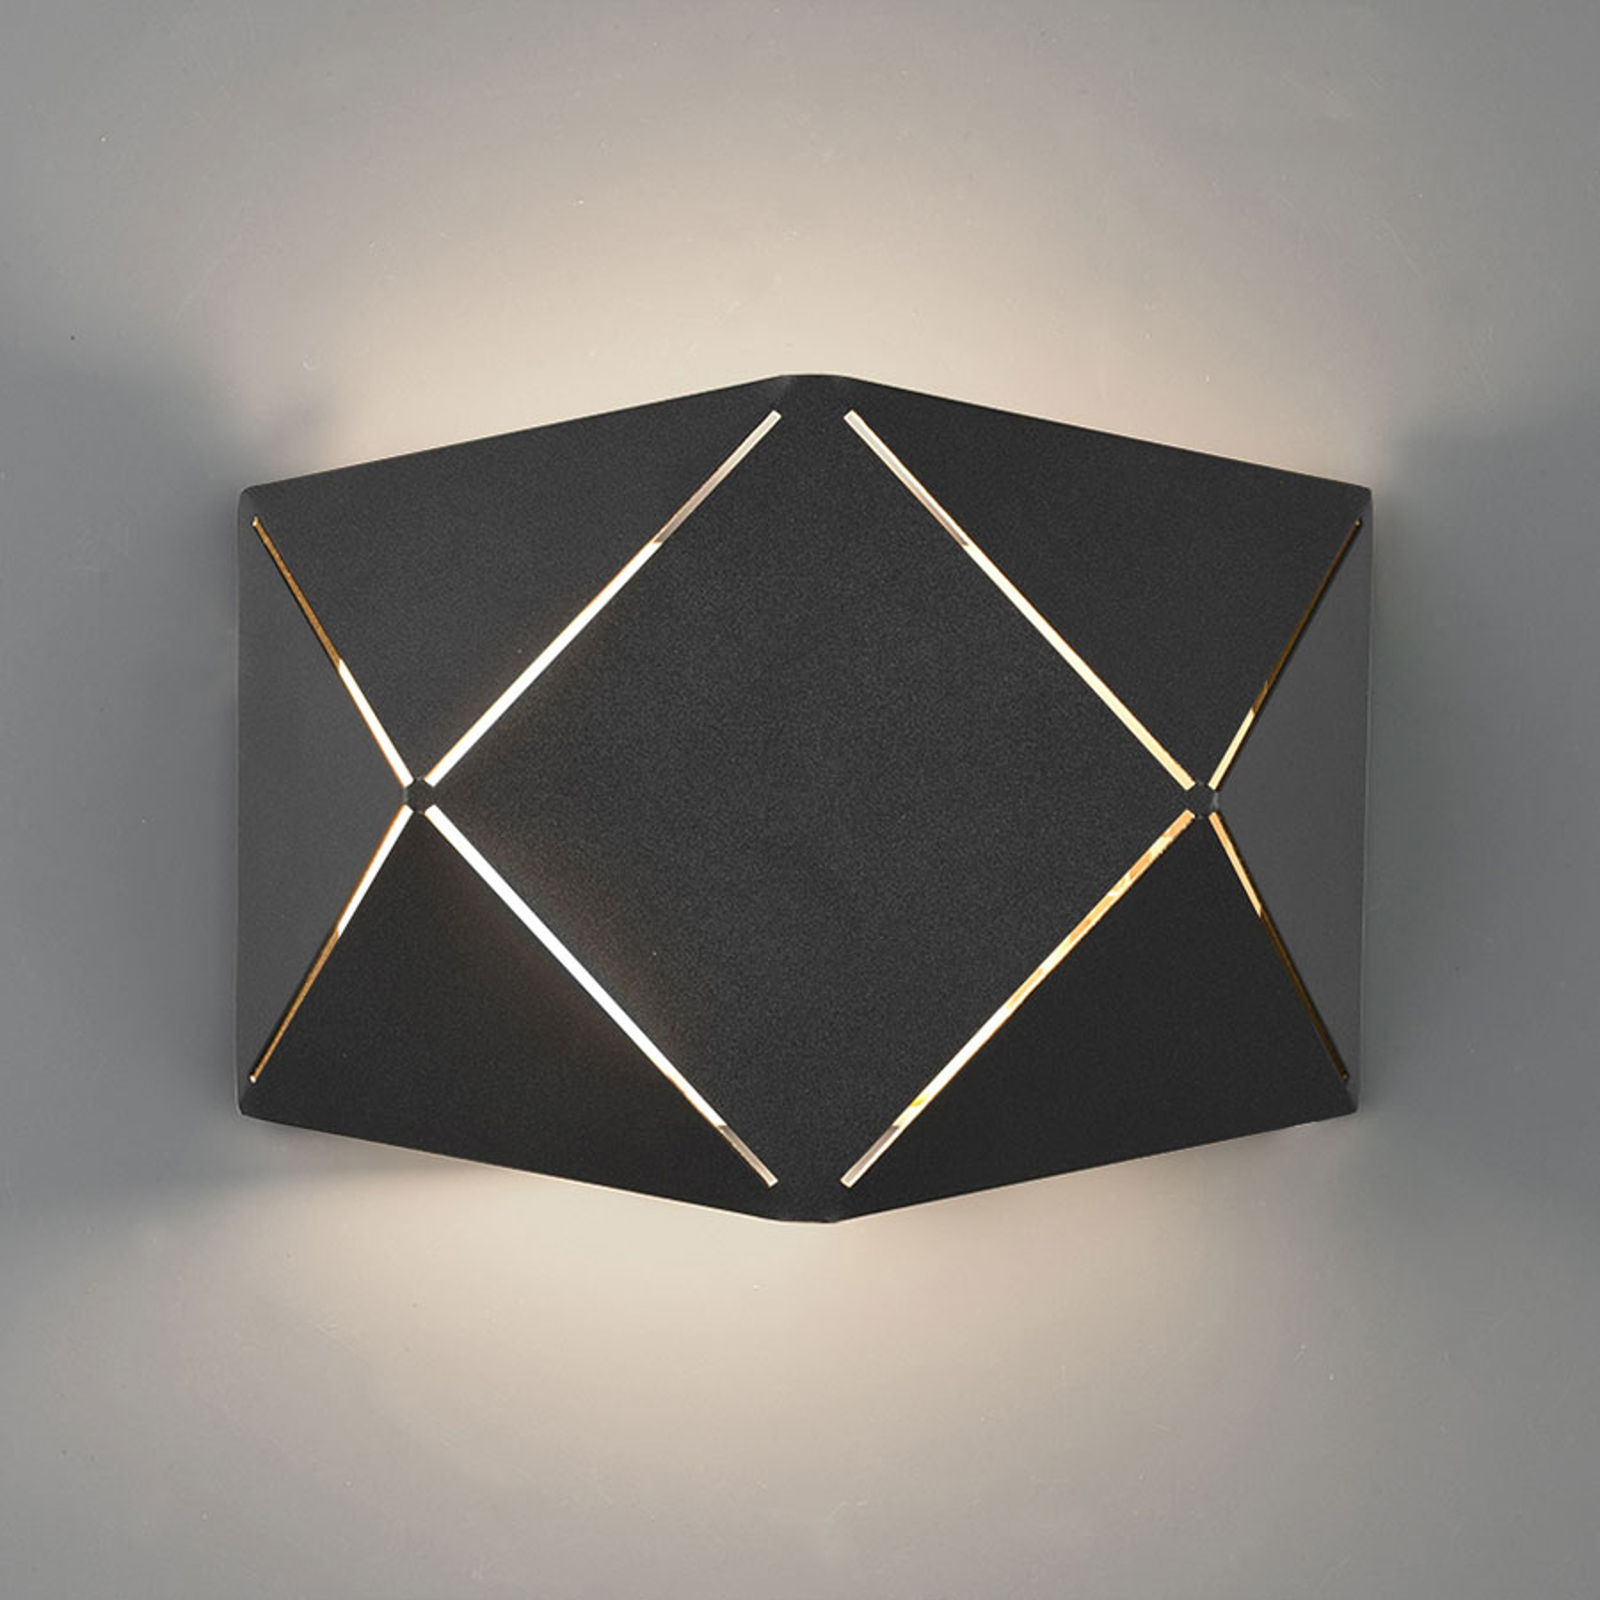 LED-seinävalaisin Zandor, musta, leveys 18 cm